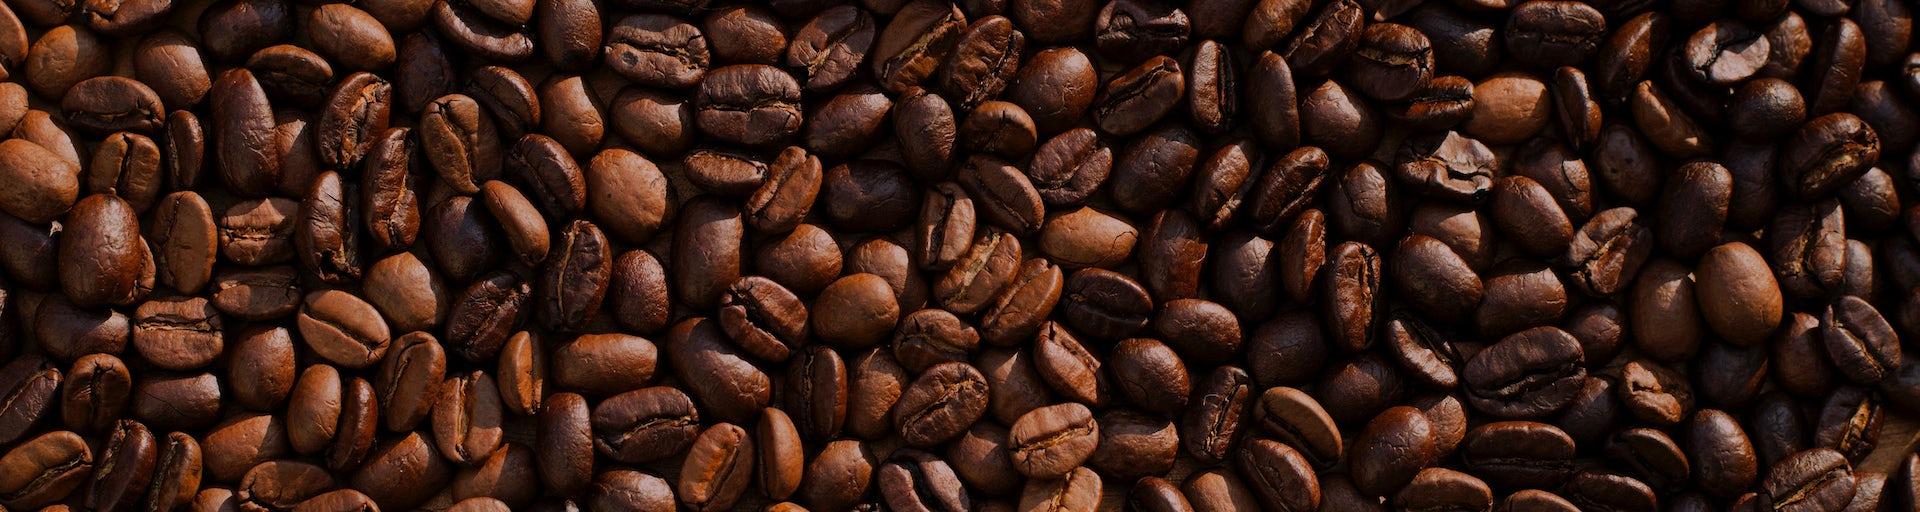 Koffie uit kaffa